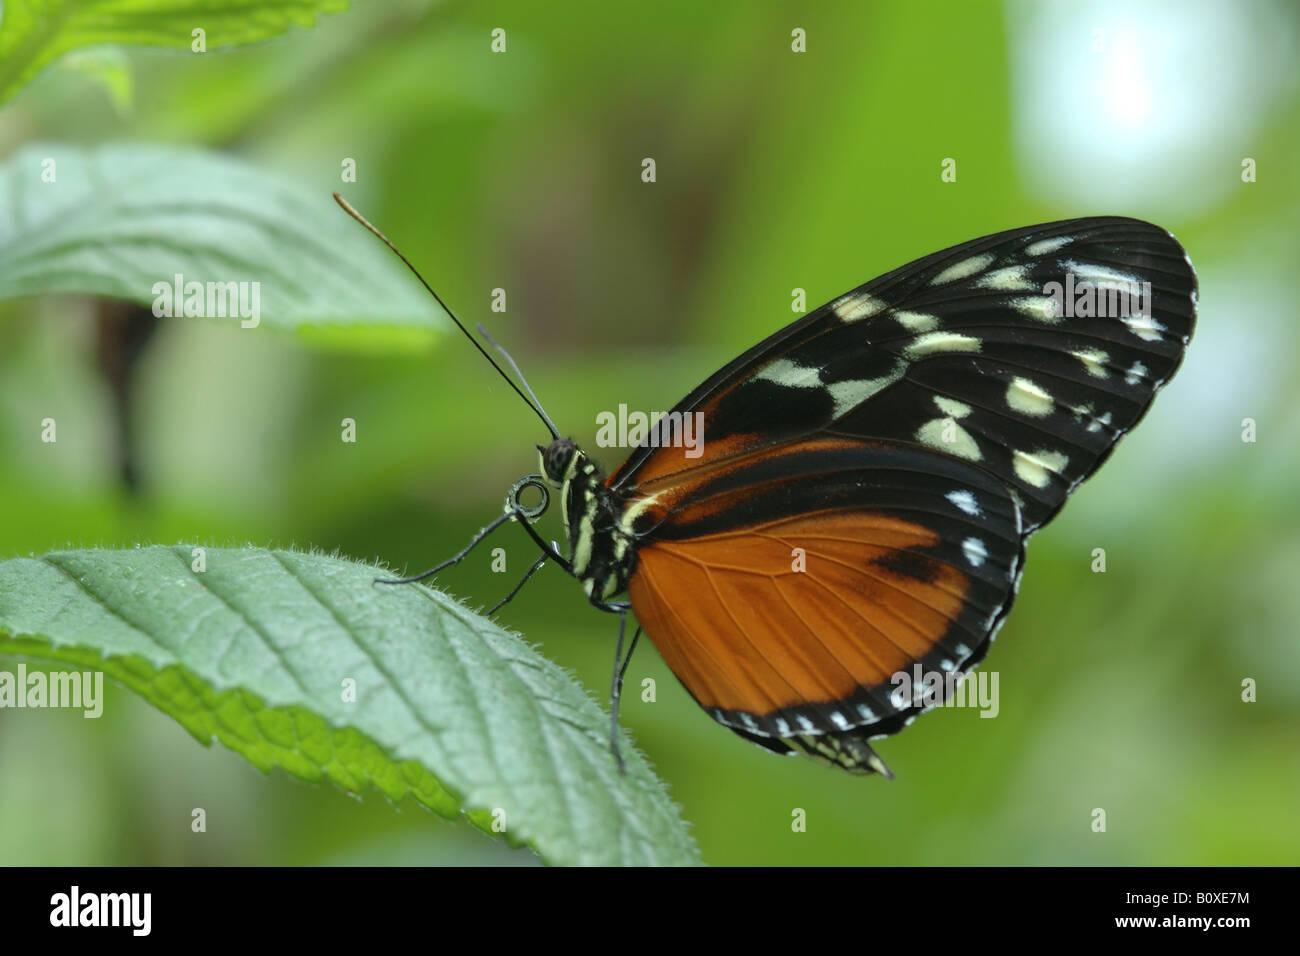 Butterfly Heliconius hecale zuleika insetti tropicali farfalla farfalla tropicale Heliconius eliconidi insetti velenosi Foto Stock